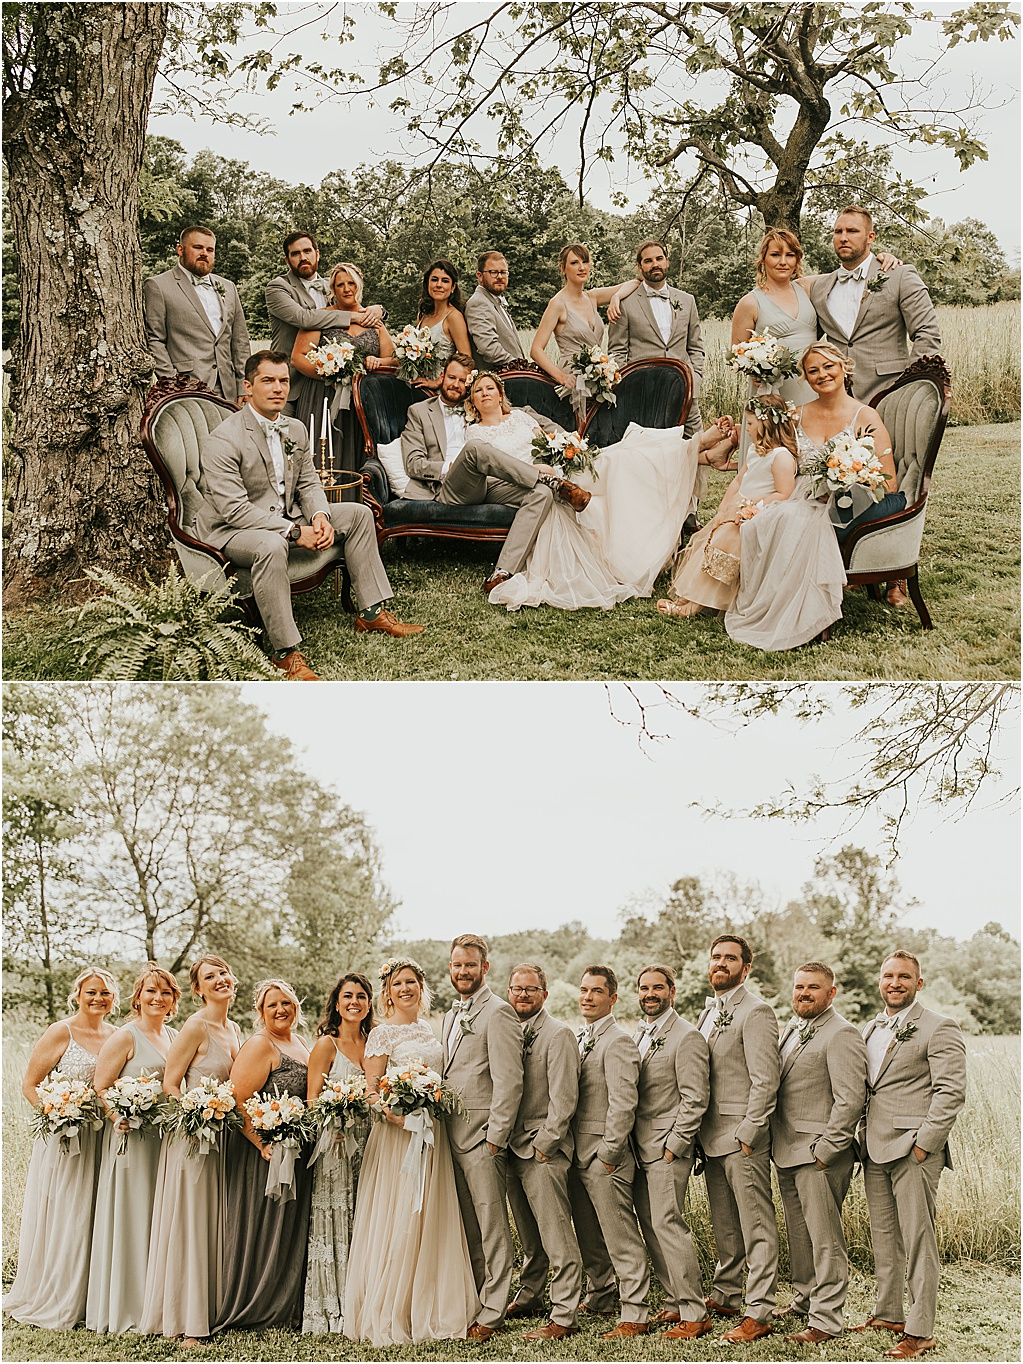 brittany_boote_pennsylvania_wedding_photographer_0438.jpg